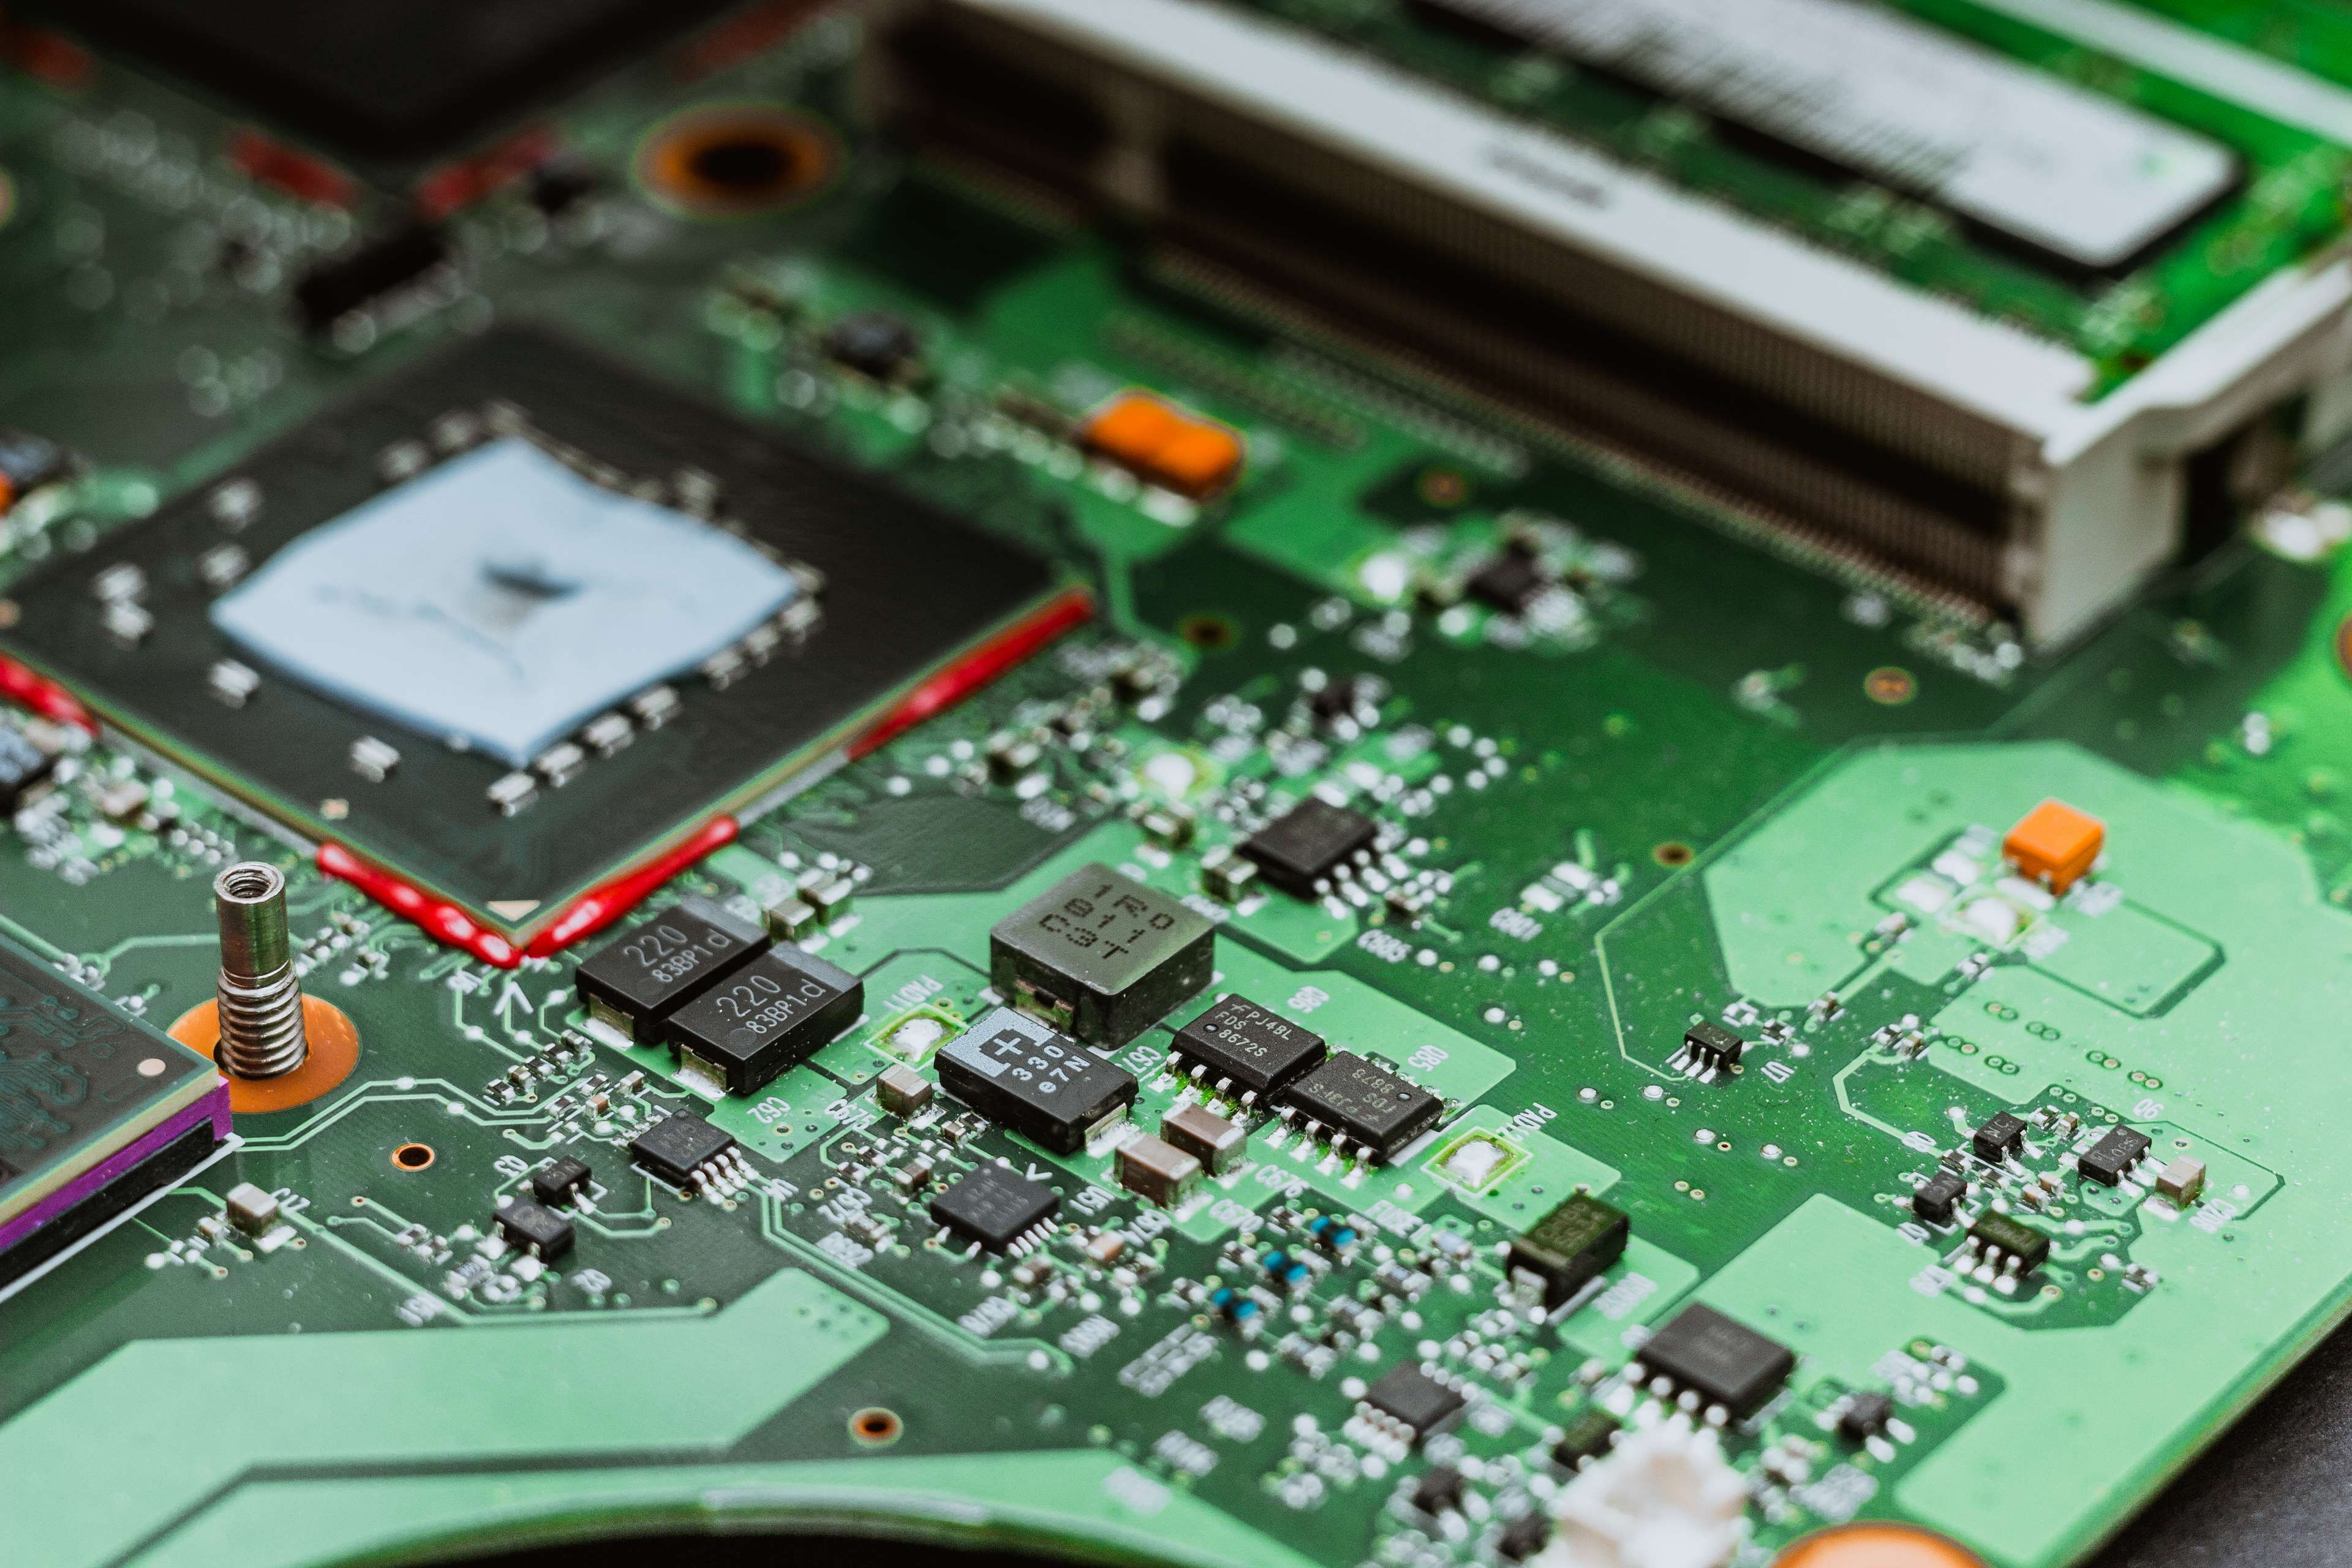 Circuit Board Close Computer Computer Chip Computer Part Cpu Data Desktop Pc Digitally Generated Computer Chip Computer Parts And Components Computer